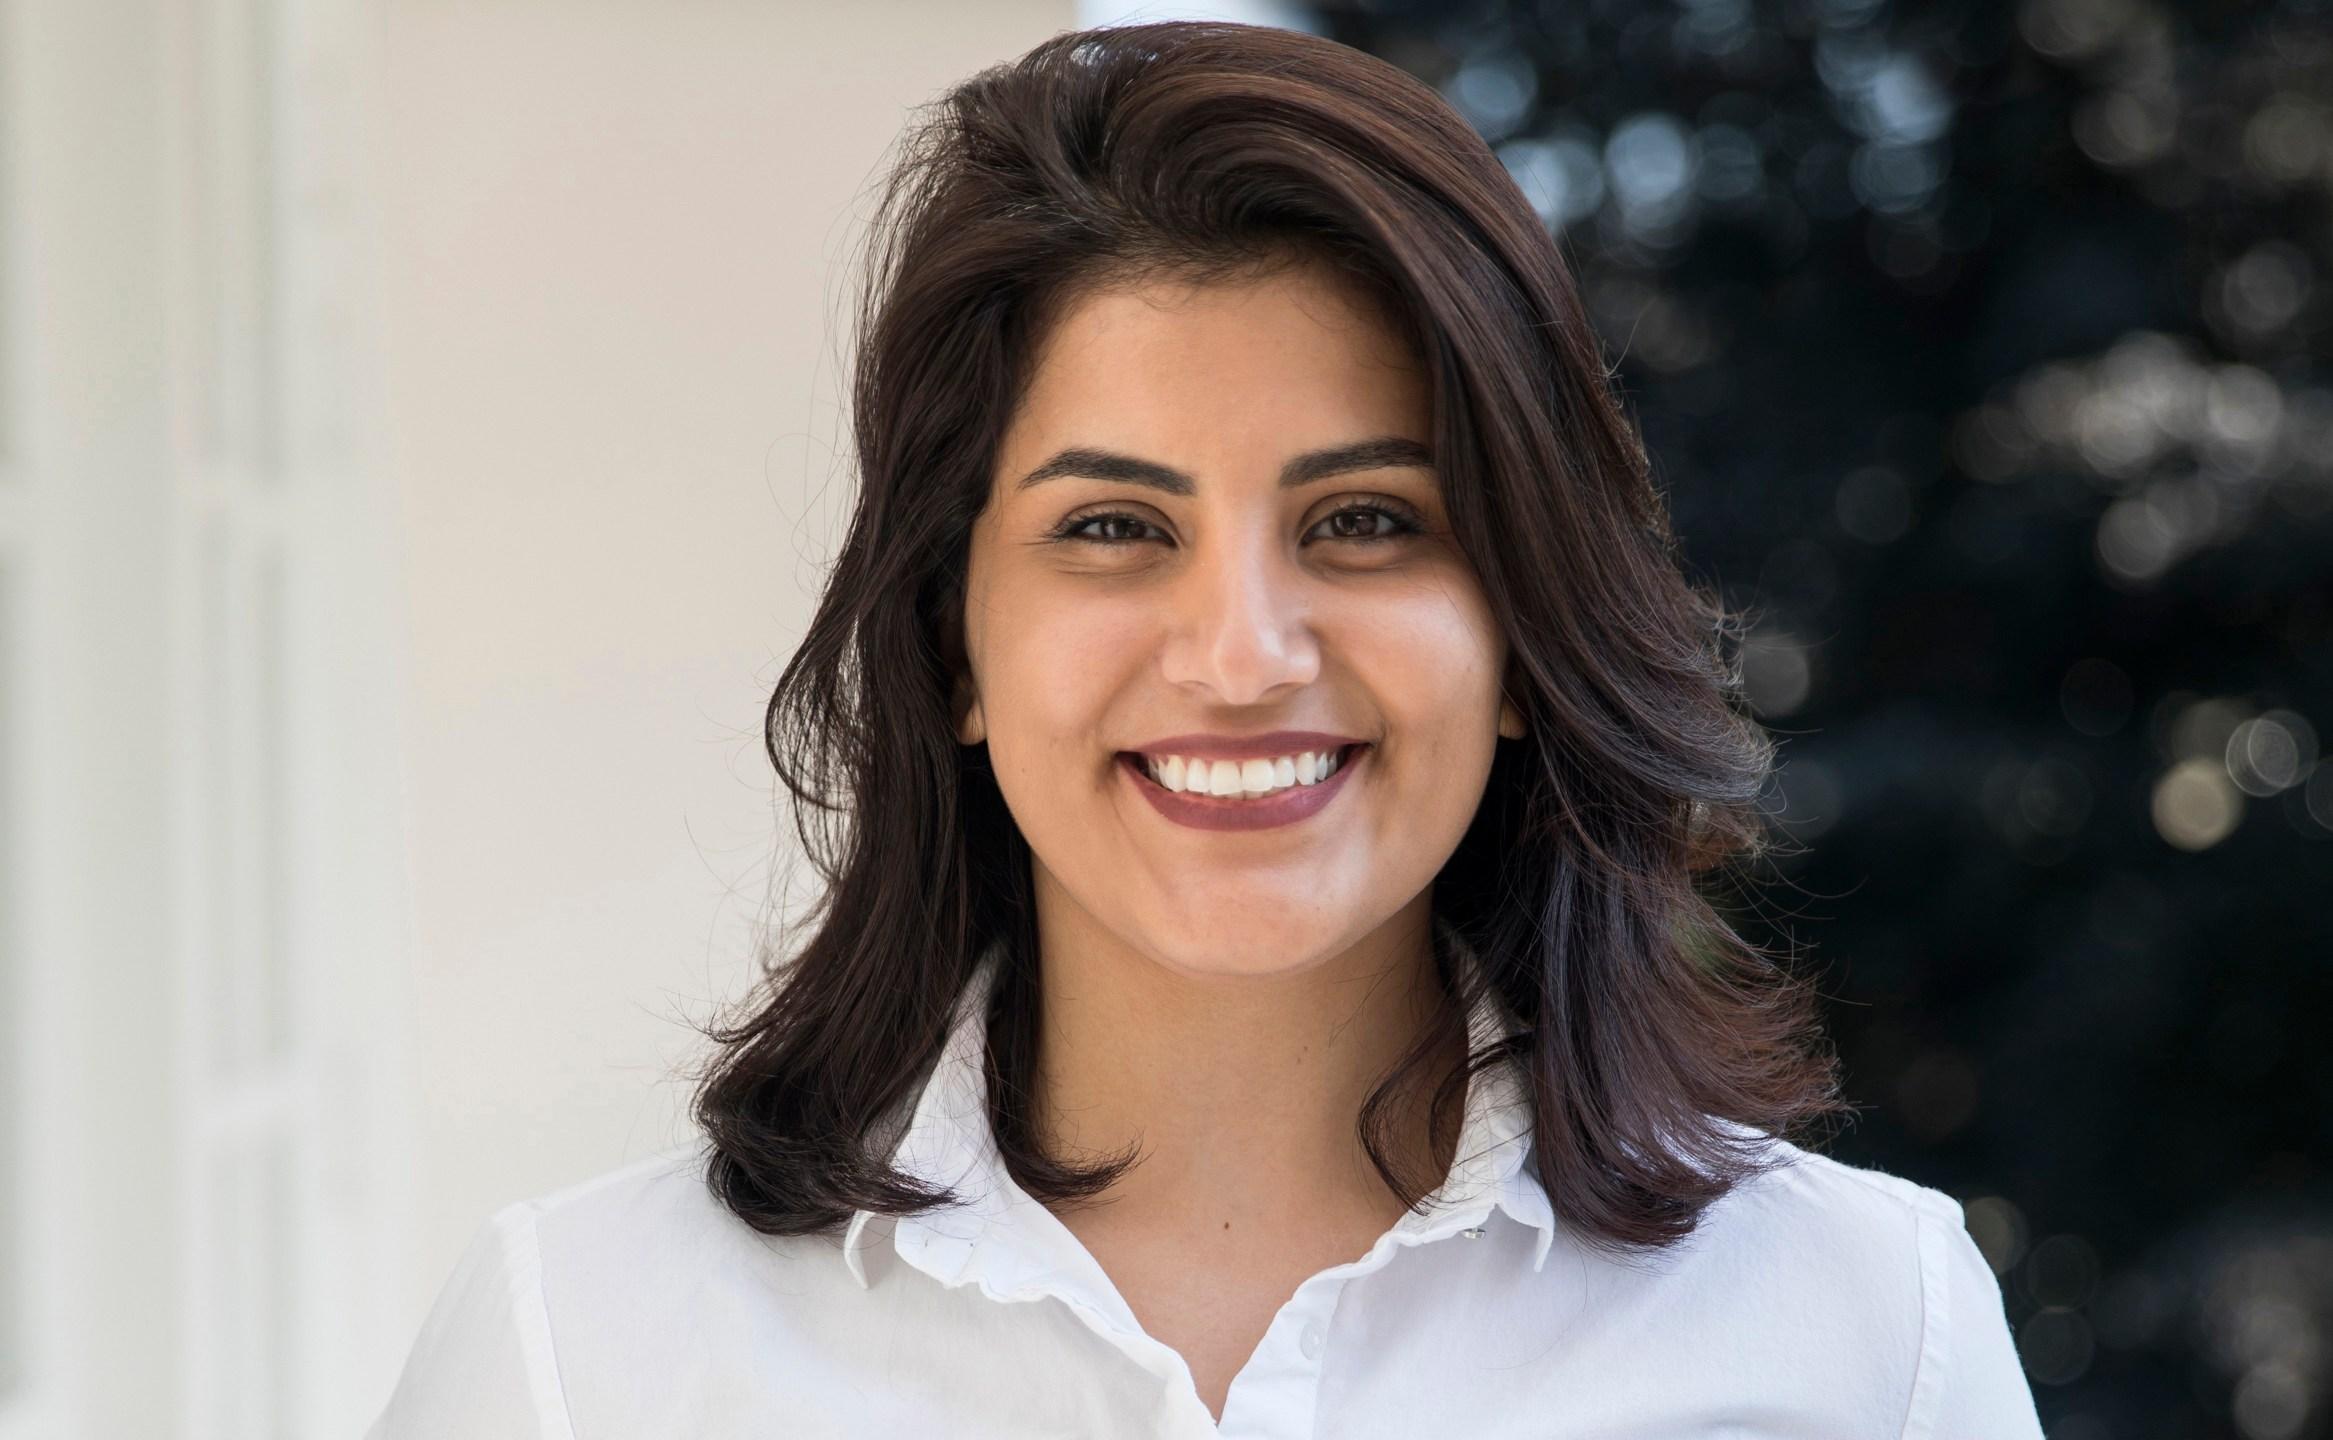 Loujain al-Hathloul